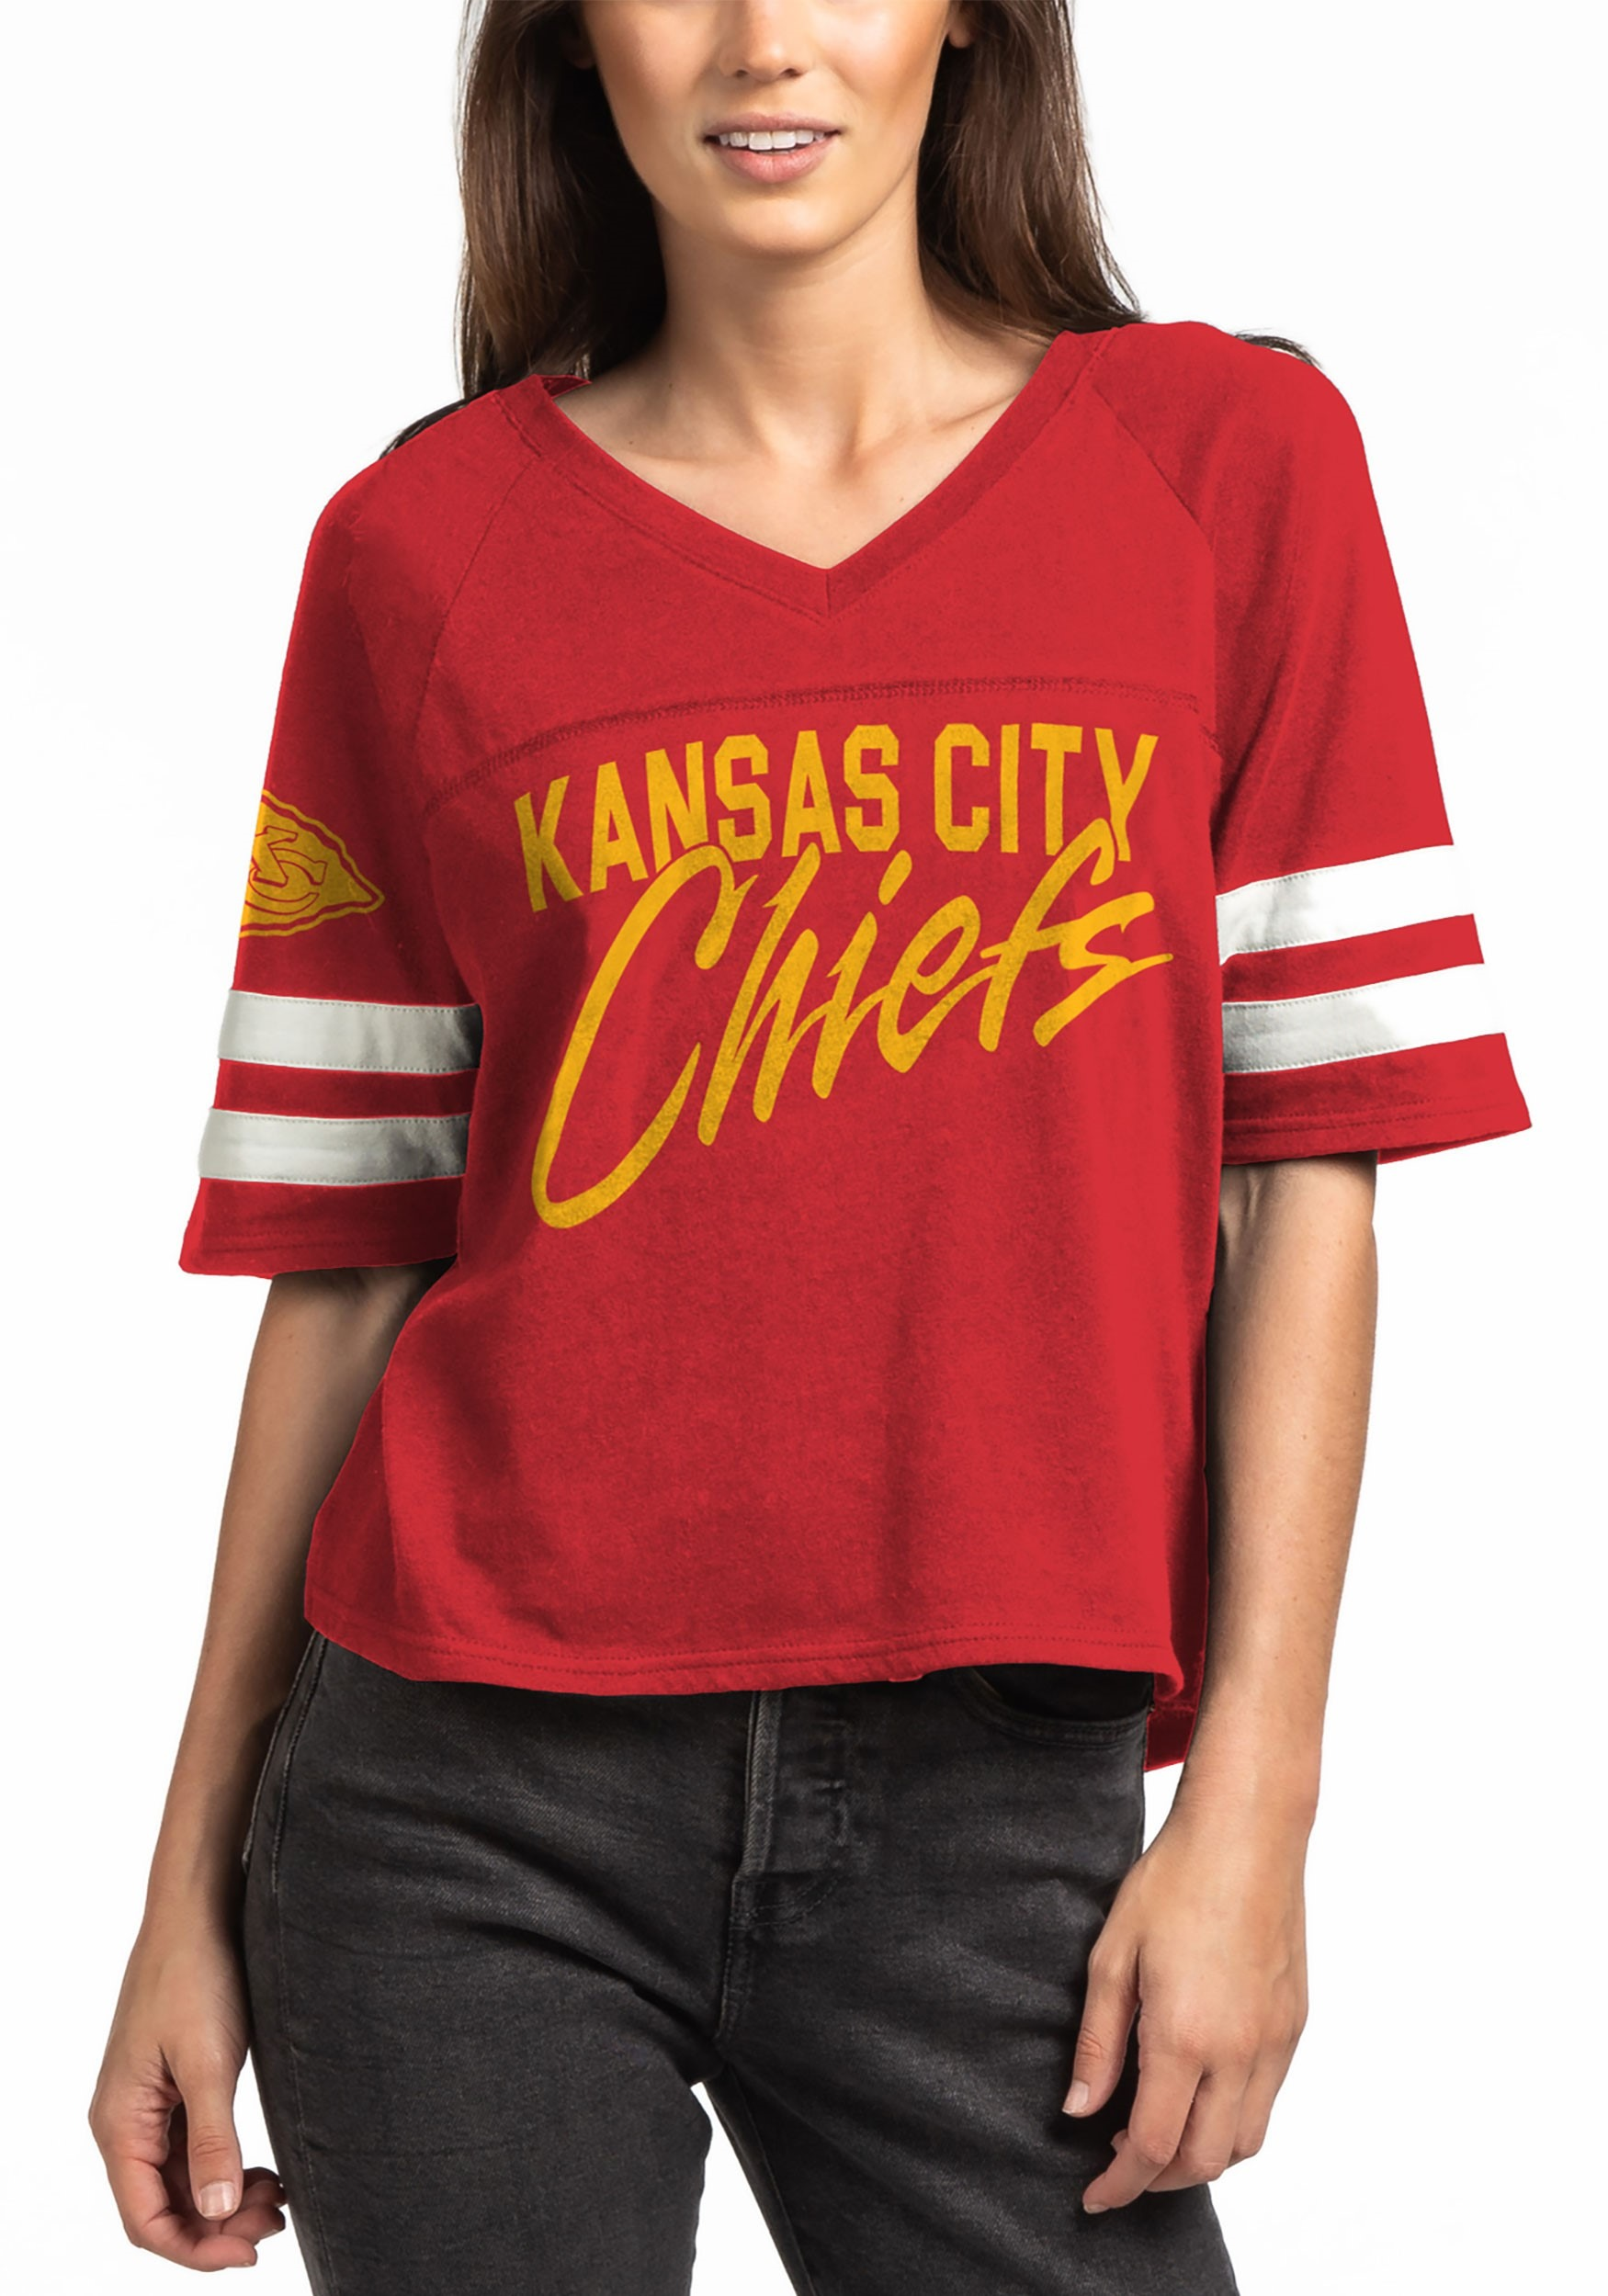 Womens Red Kansas City Chiefs V-Neck Football Tee